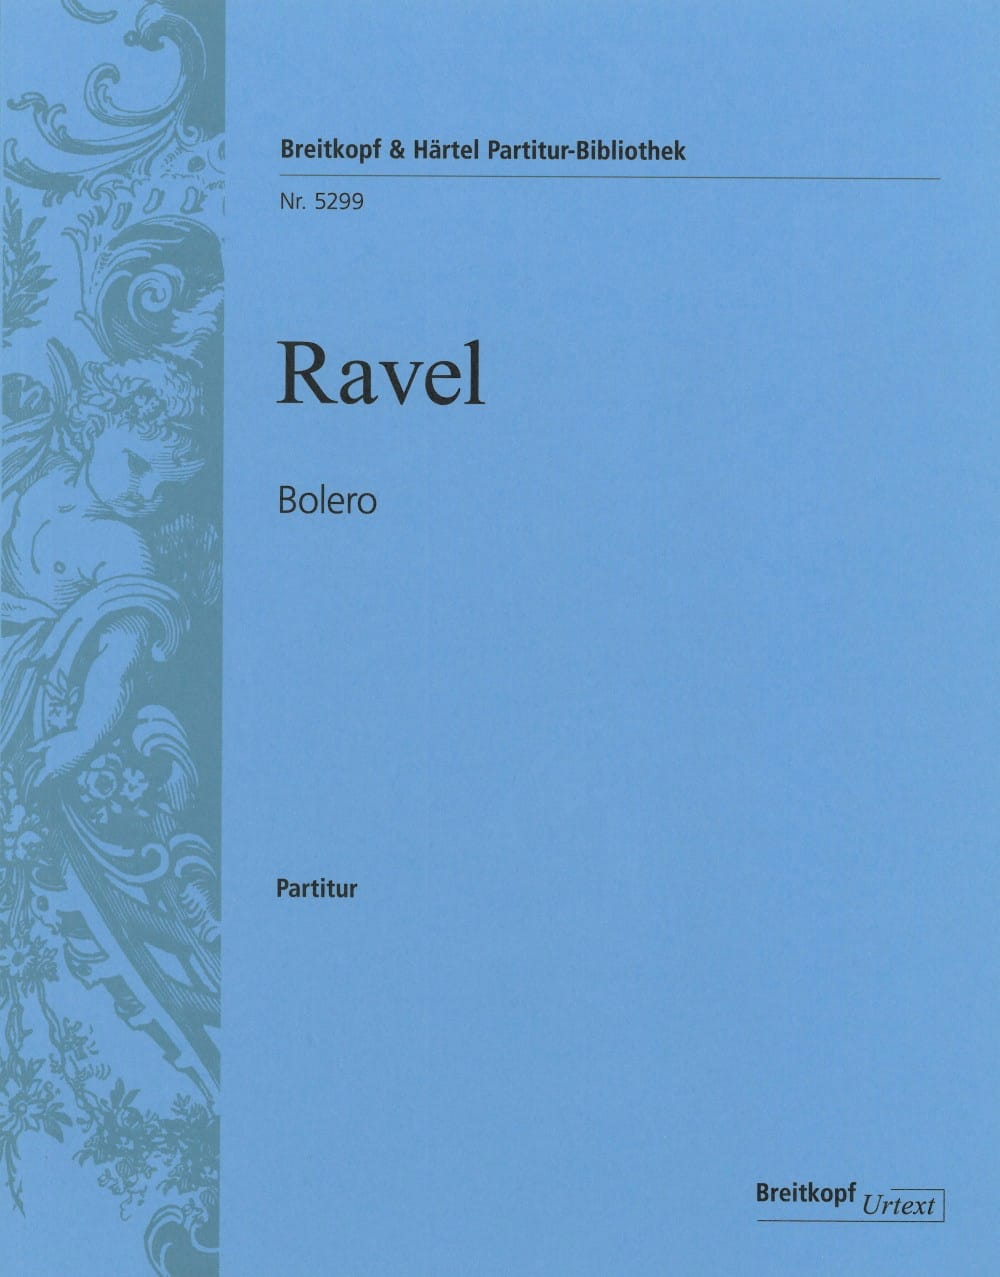 Boléro - RAVEL - Partition - Grand format - laflutedepan.com